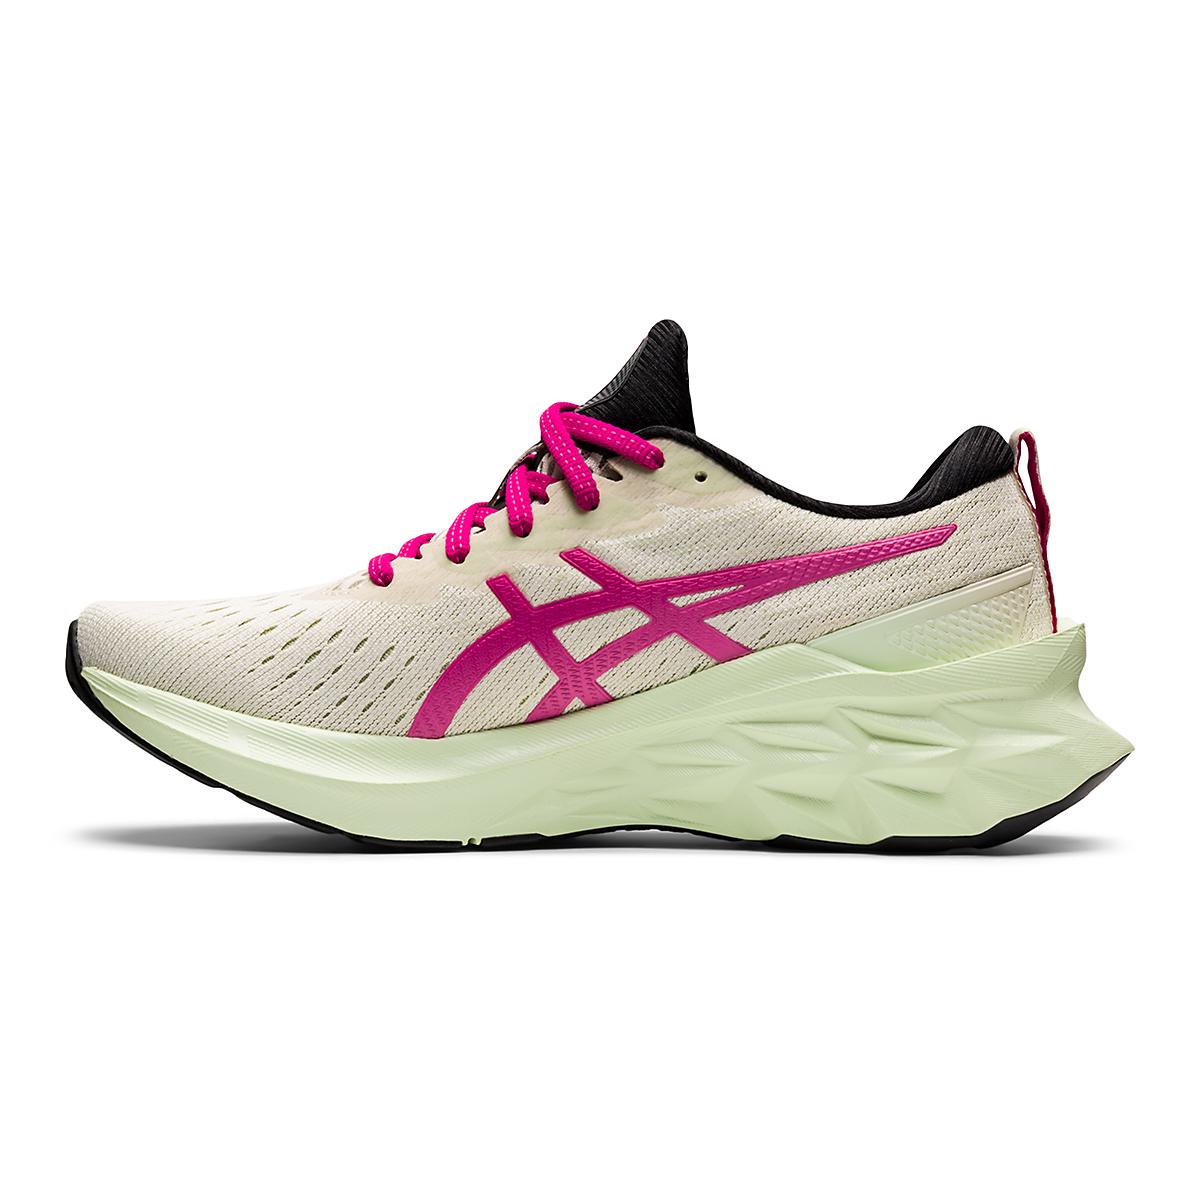 Women's Asics Novablast 2 Running Shoe - Color: Birch/Pink Rave - Size: 5 - Width: Regular, Birch/Pink Rave, large, image 2